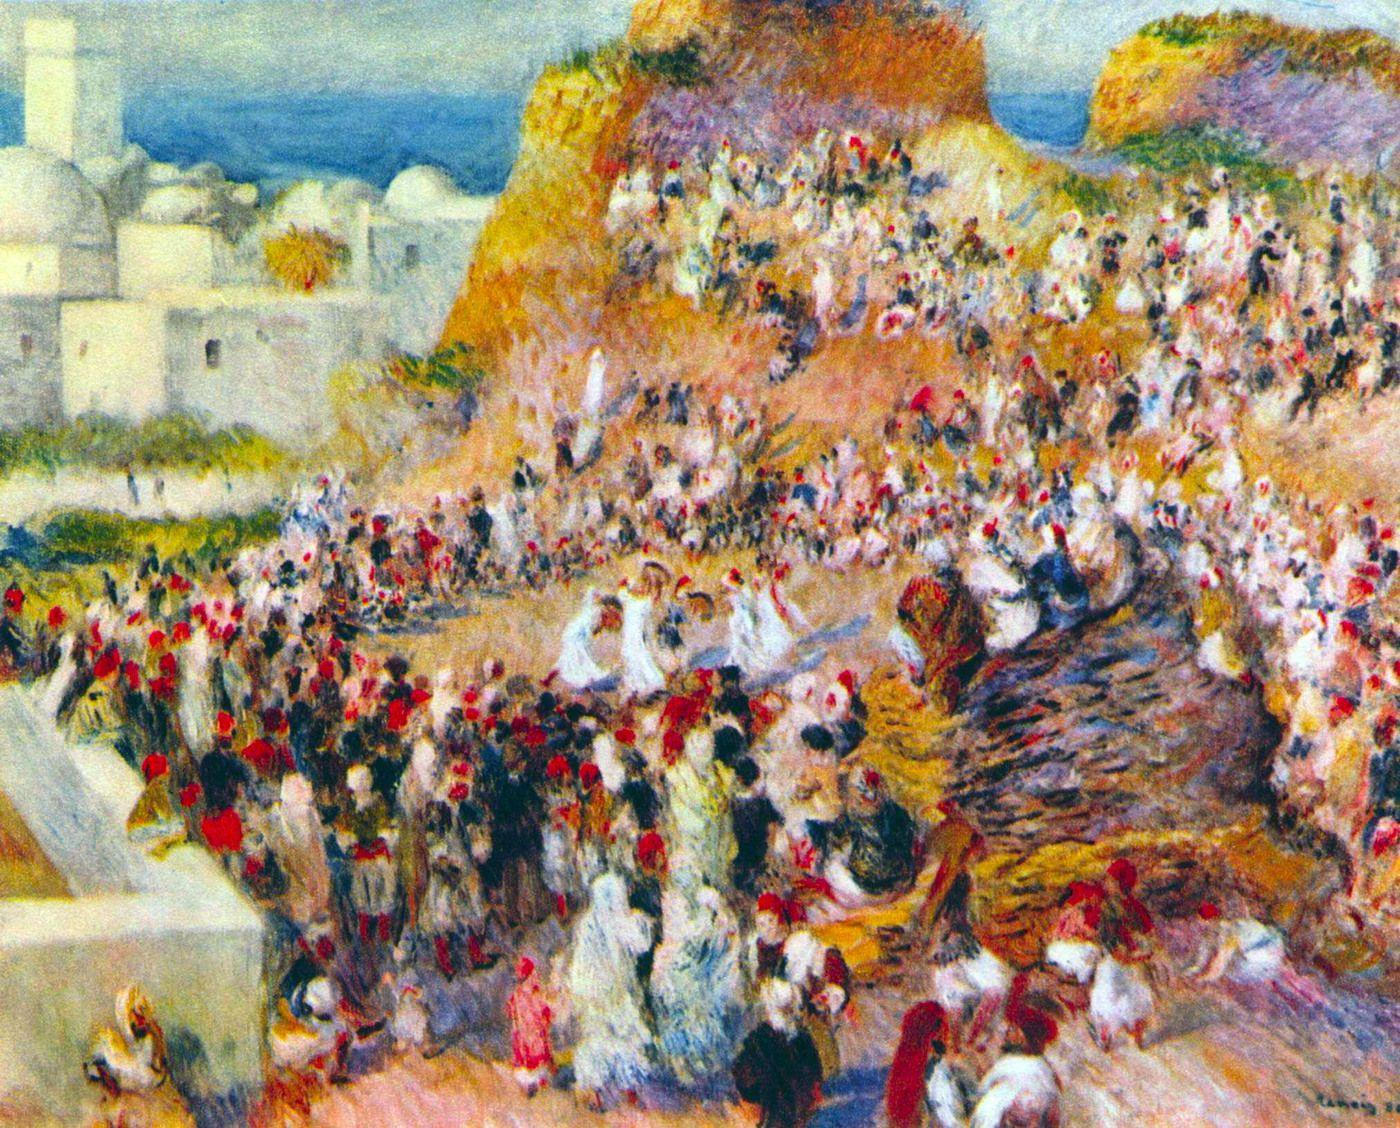 La fiesta árabe